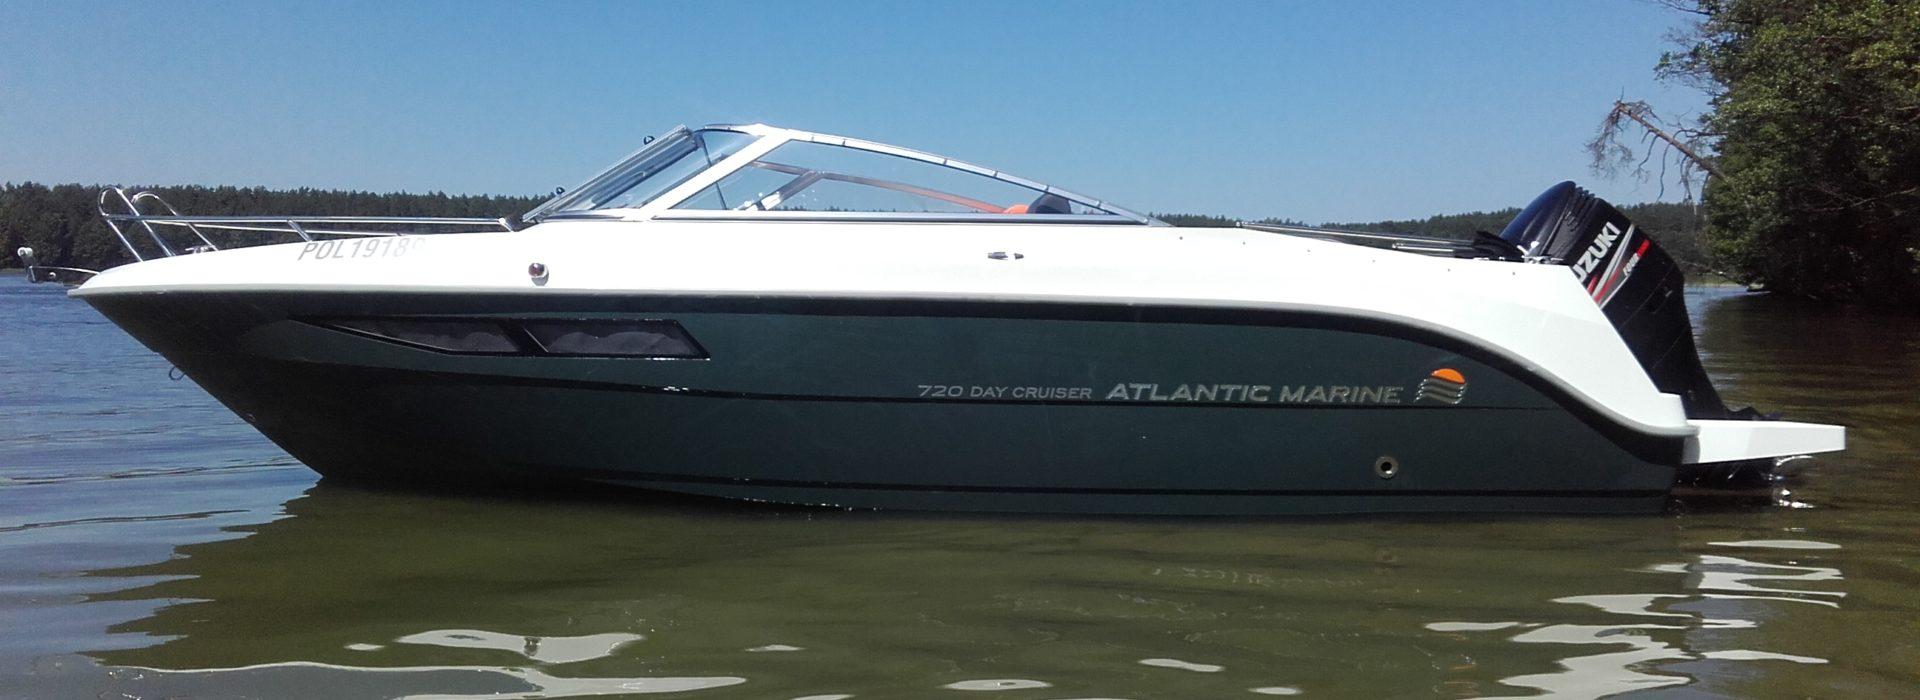 Atlantic Marine 720 Day Cruiser + Suzuki DF 300 ATX 185000,00 pln Augustów